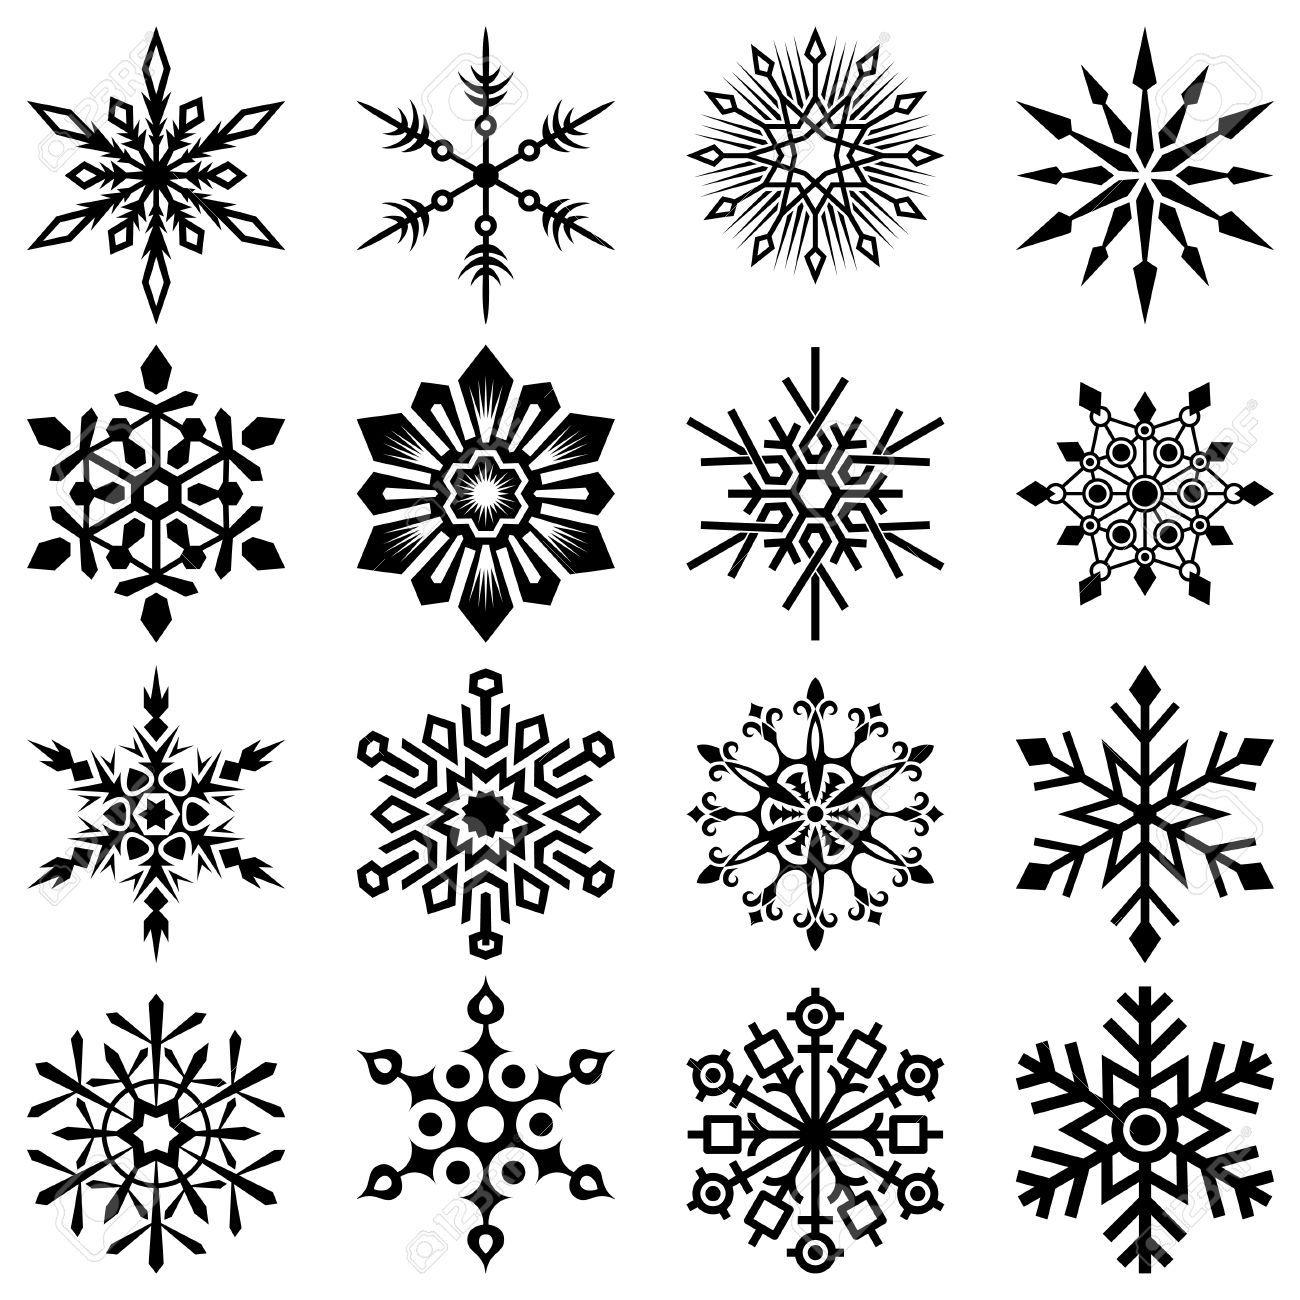 Snowflake Set Royalty Free Cliparts, Vectors, And Stock ...